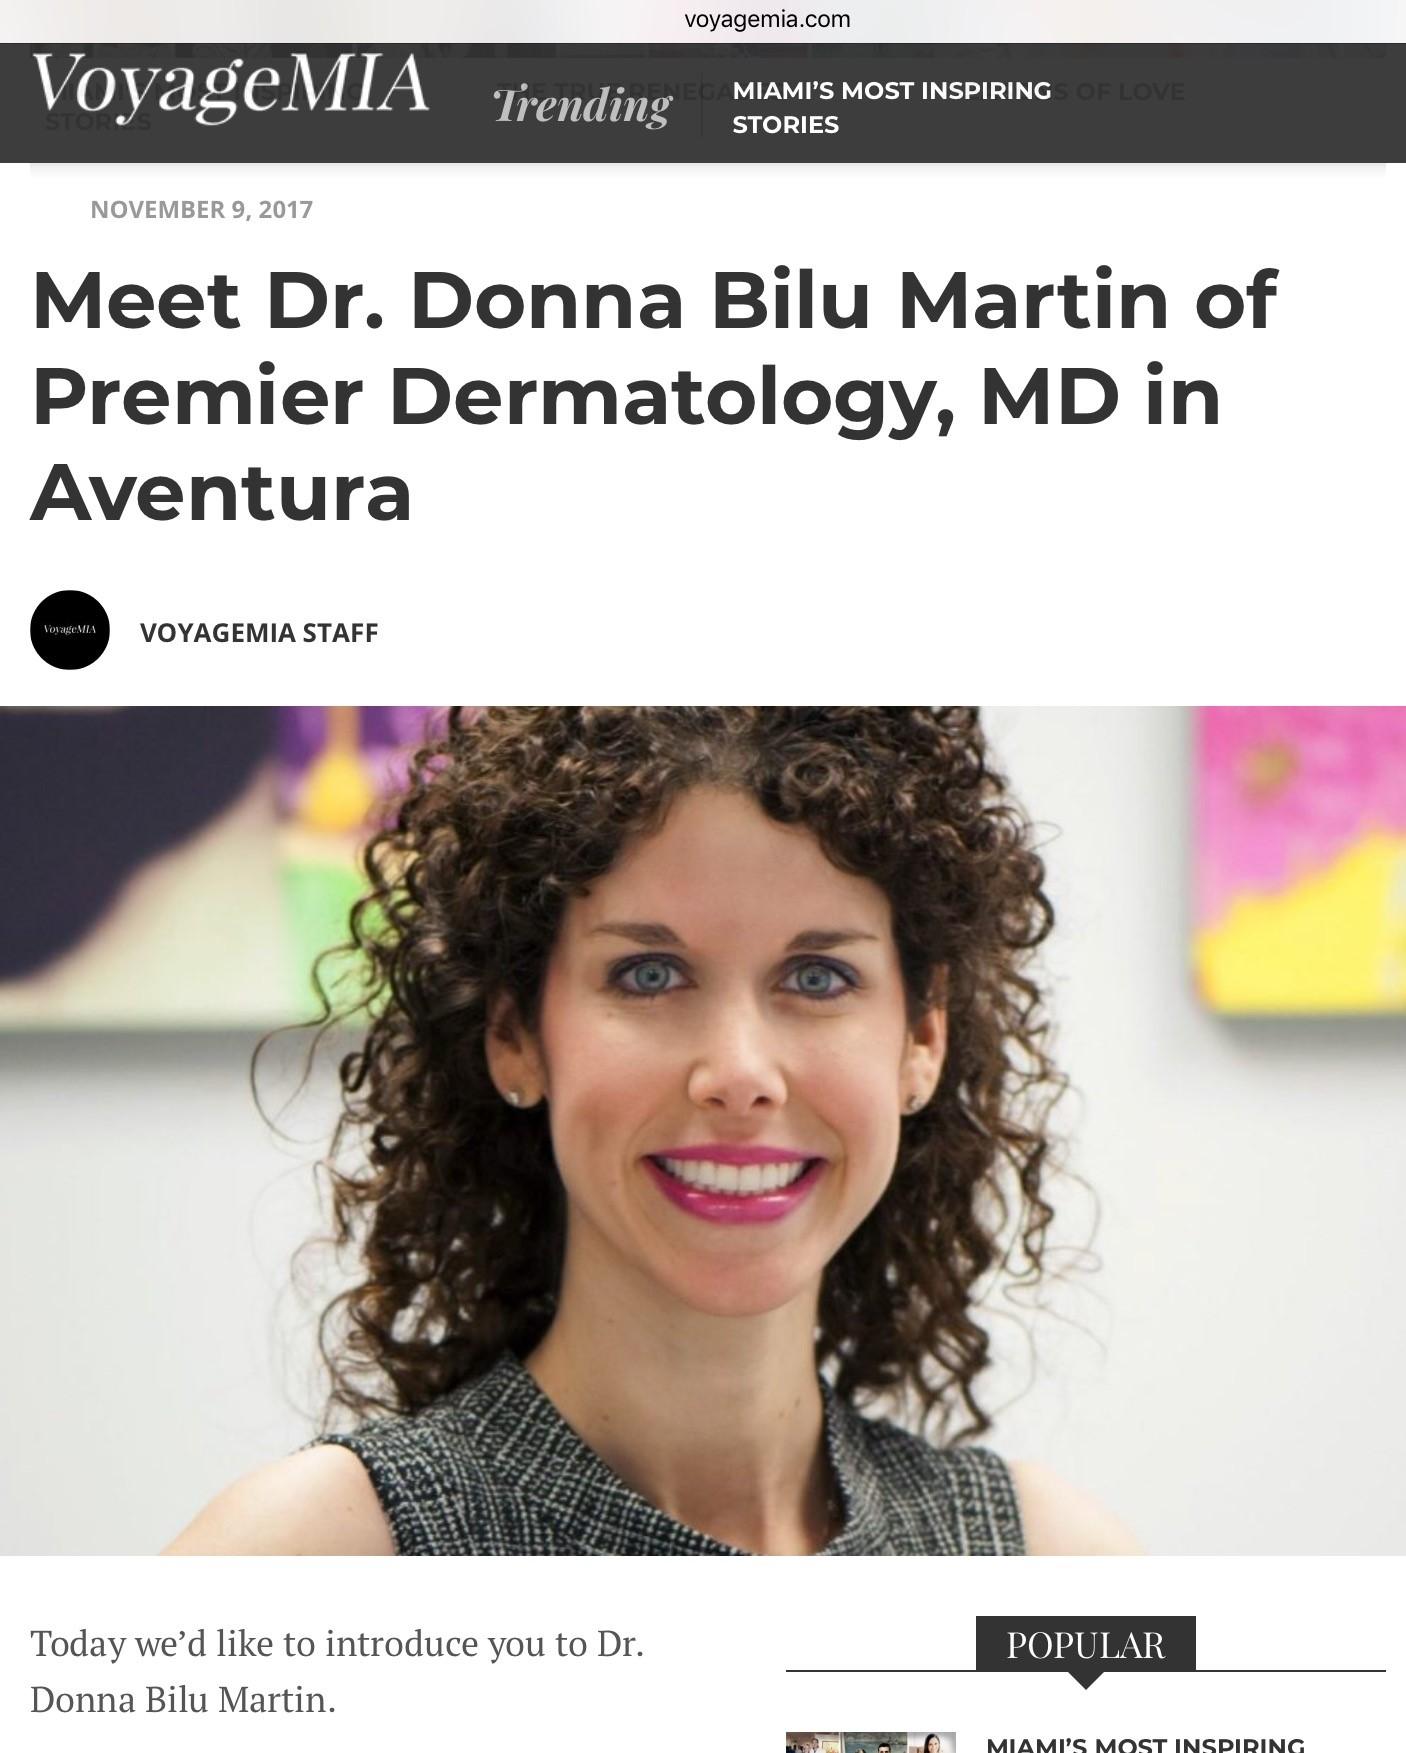 Donna Bilu Martin, MD is featured on voyagemia.com